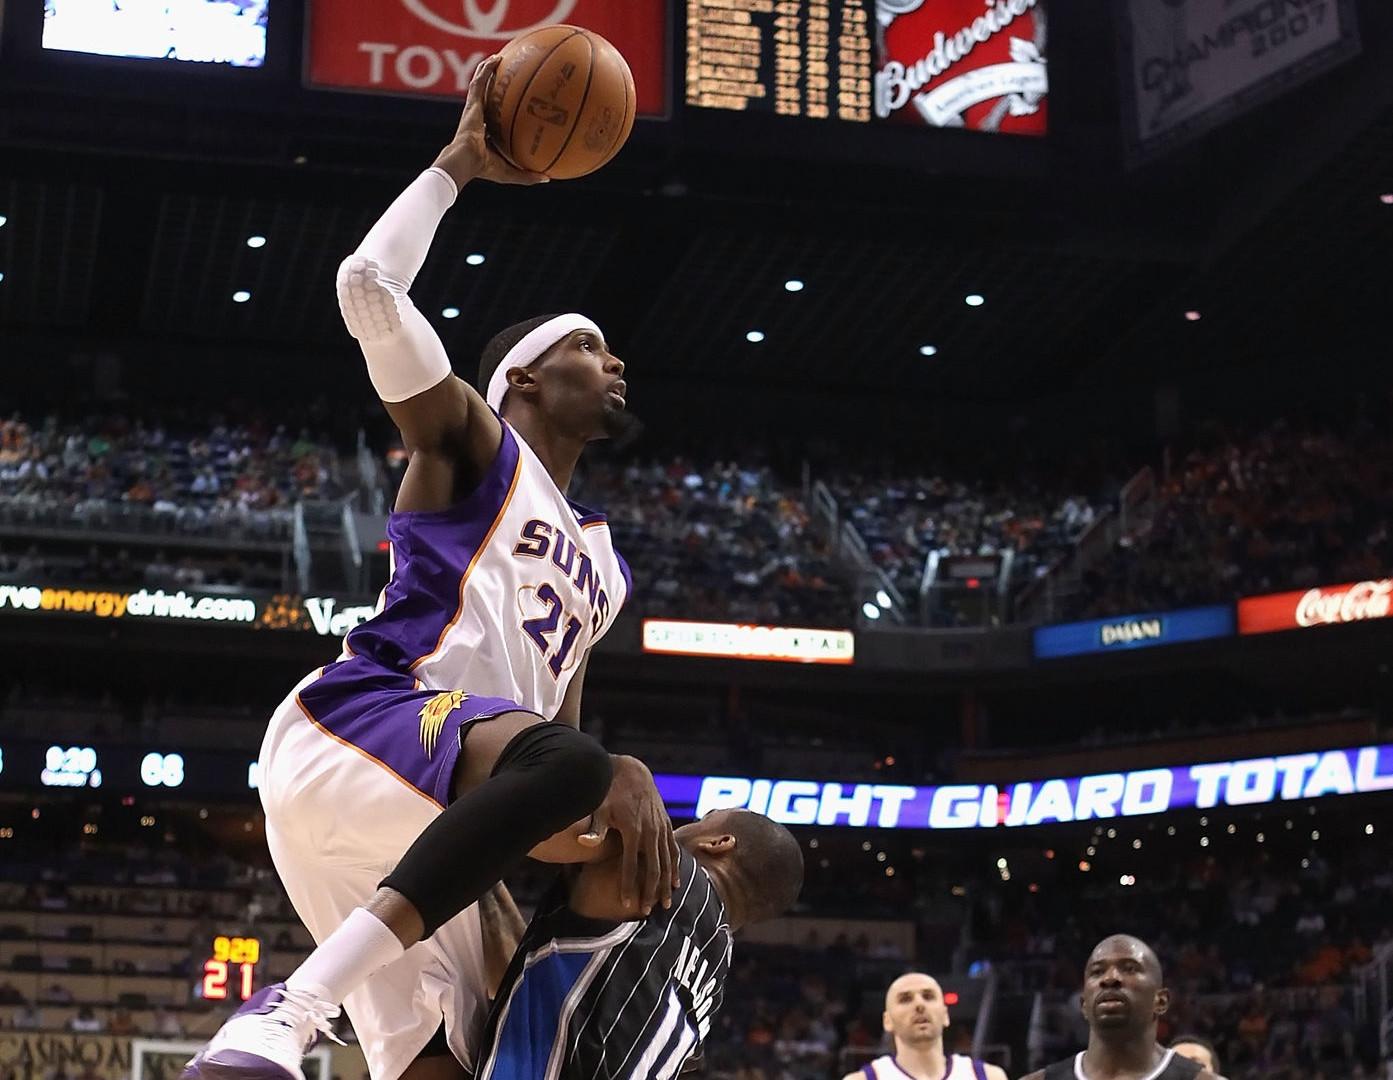 Hakim Warrick, Phoenix Suns